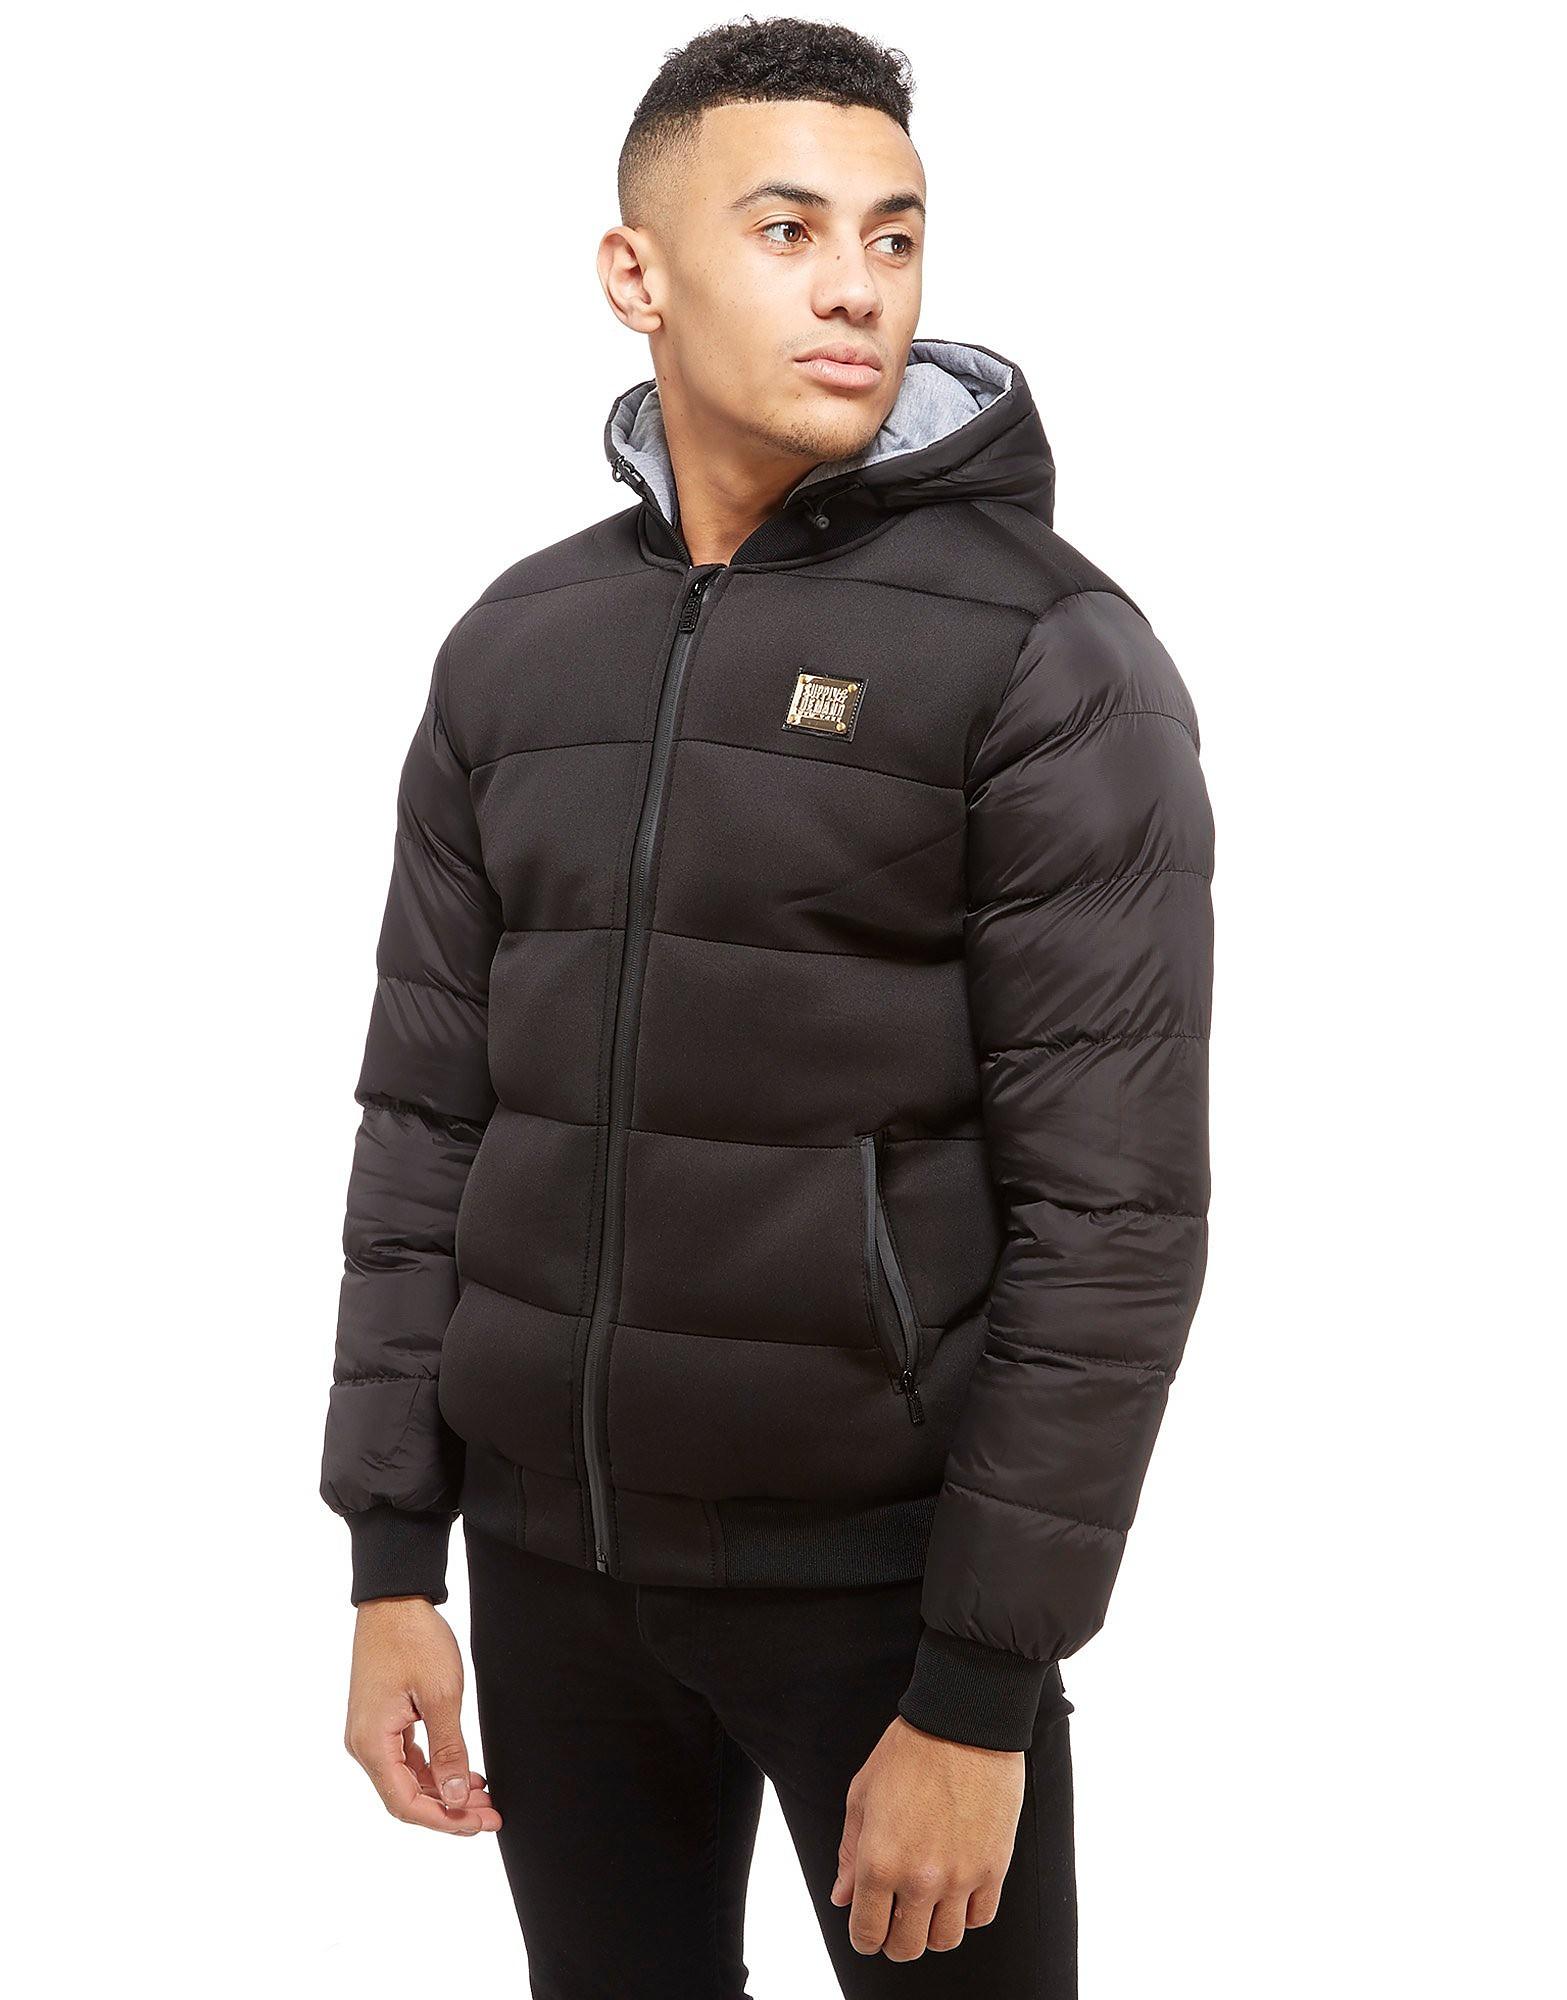 Supply & Demand Lair Jacket